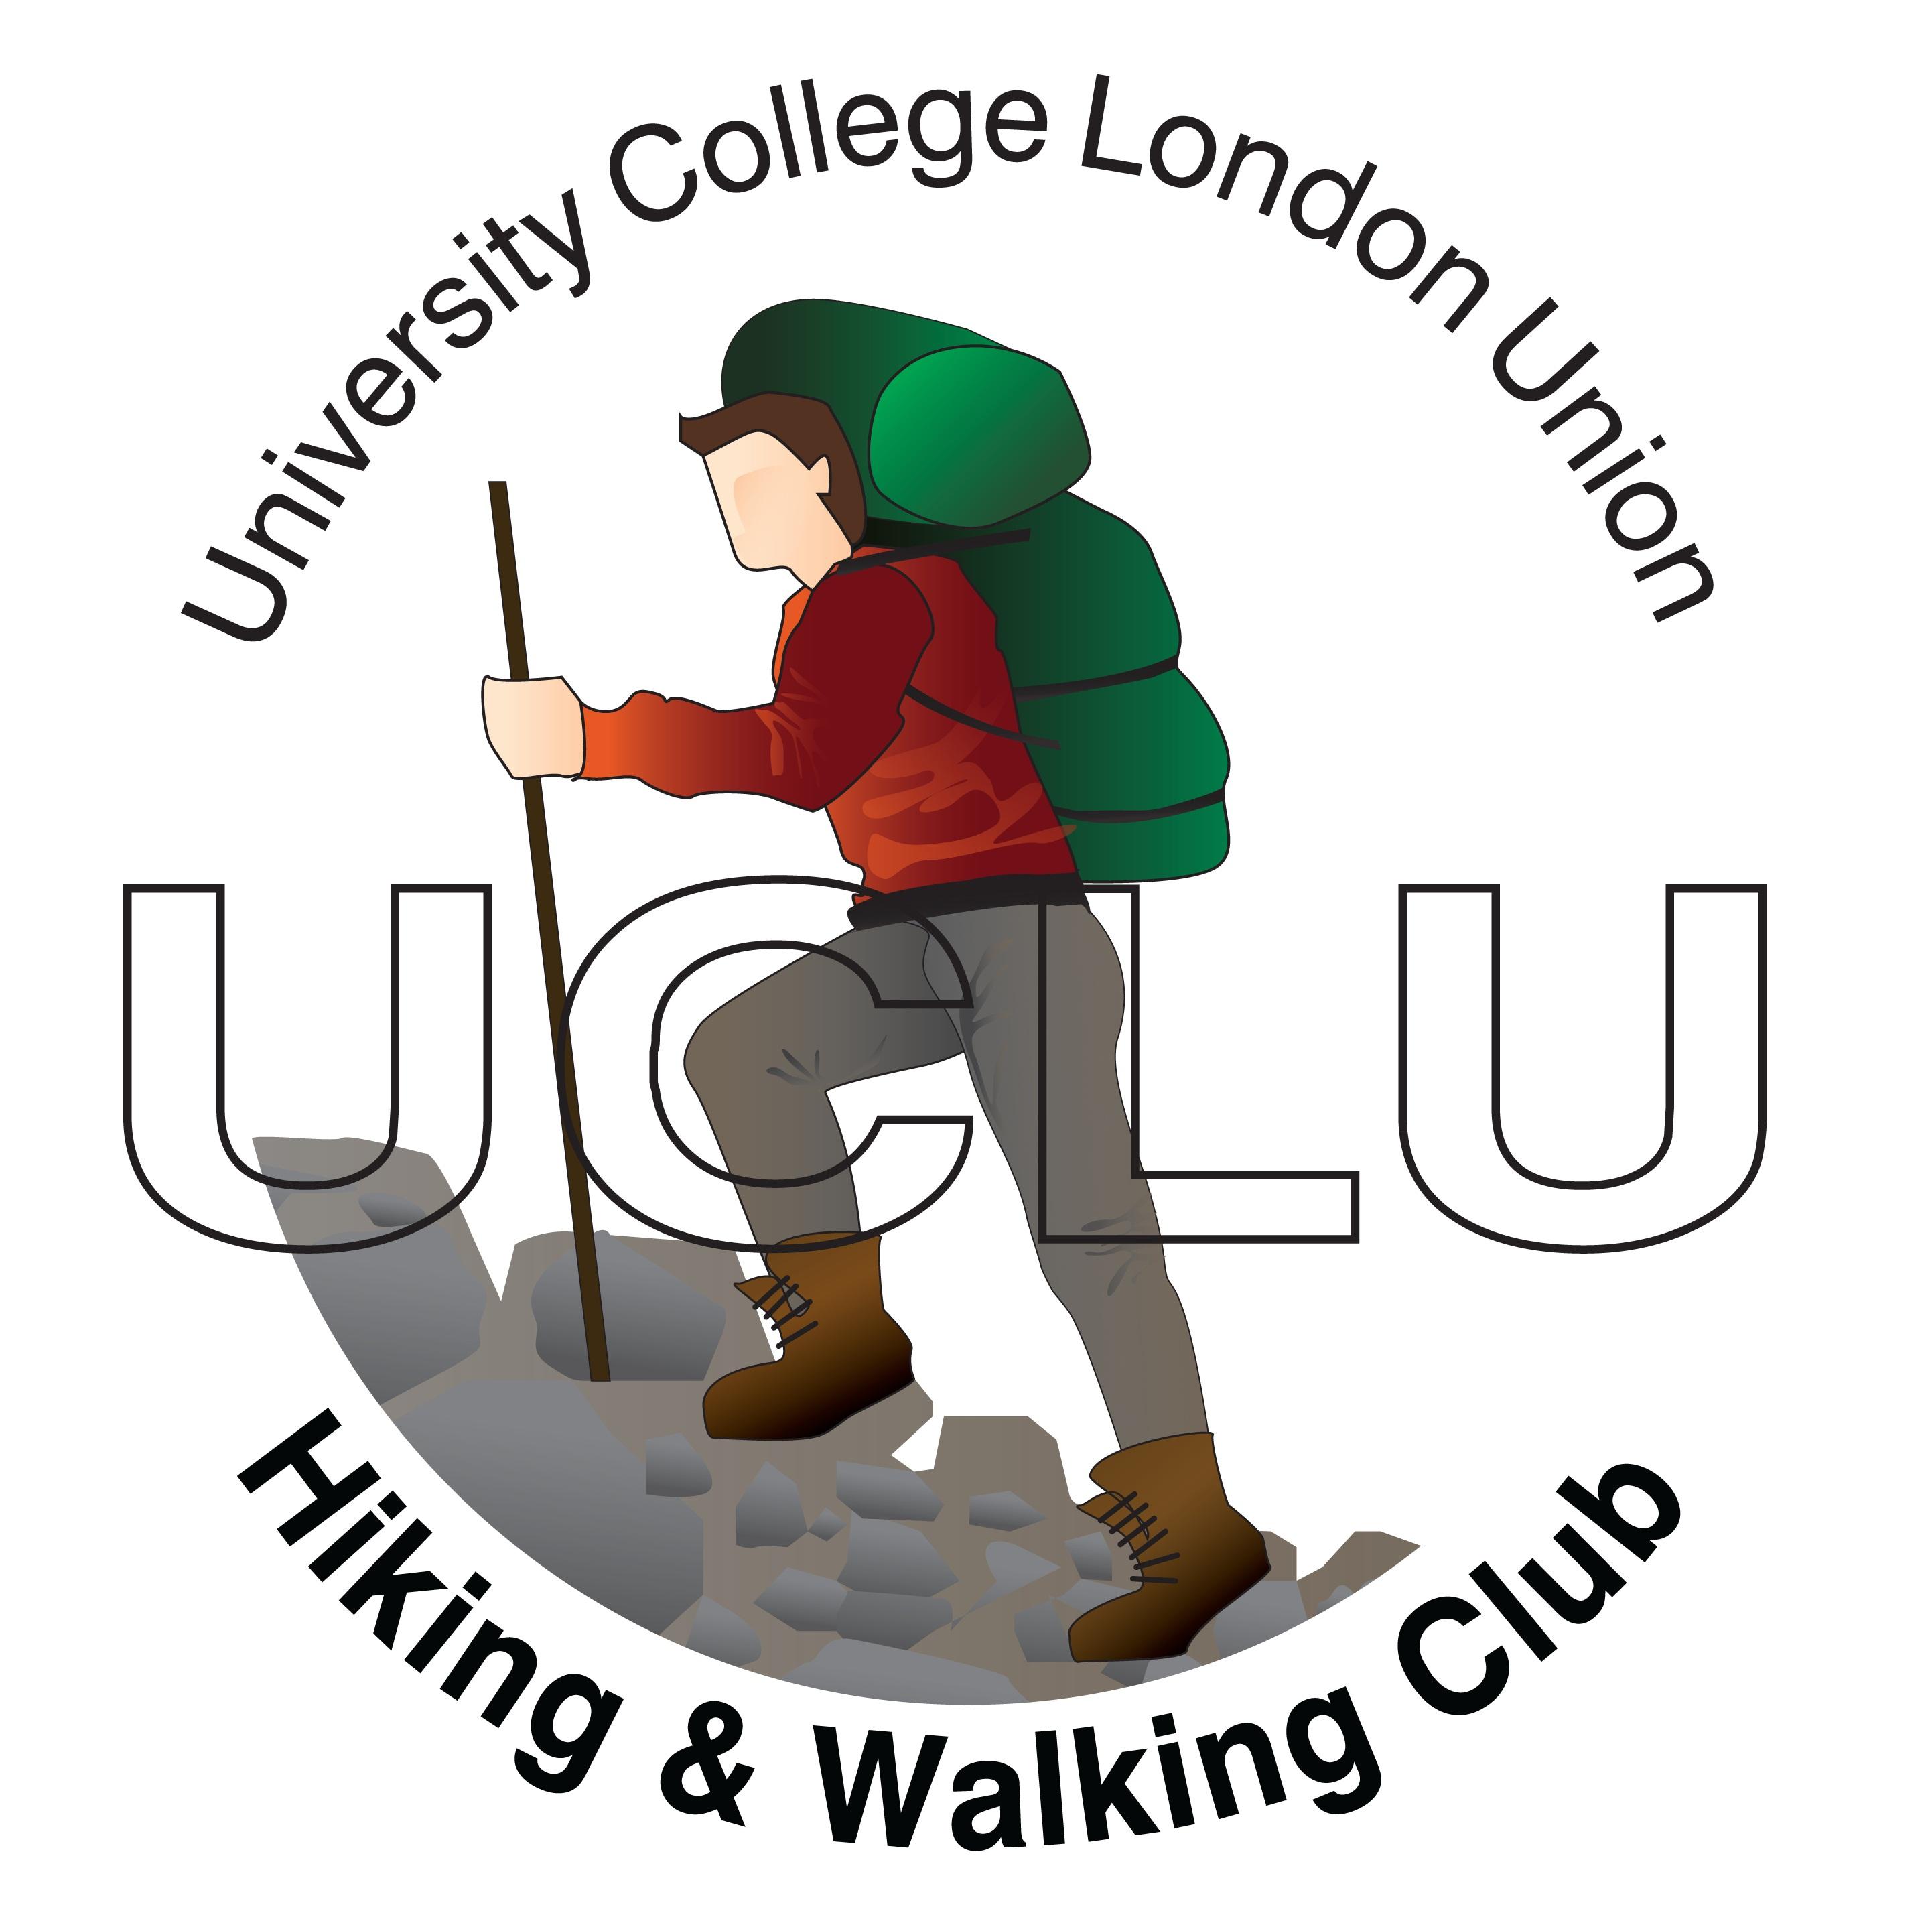 Hiking clipart walking group Club  Walking UCLU and